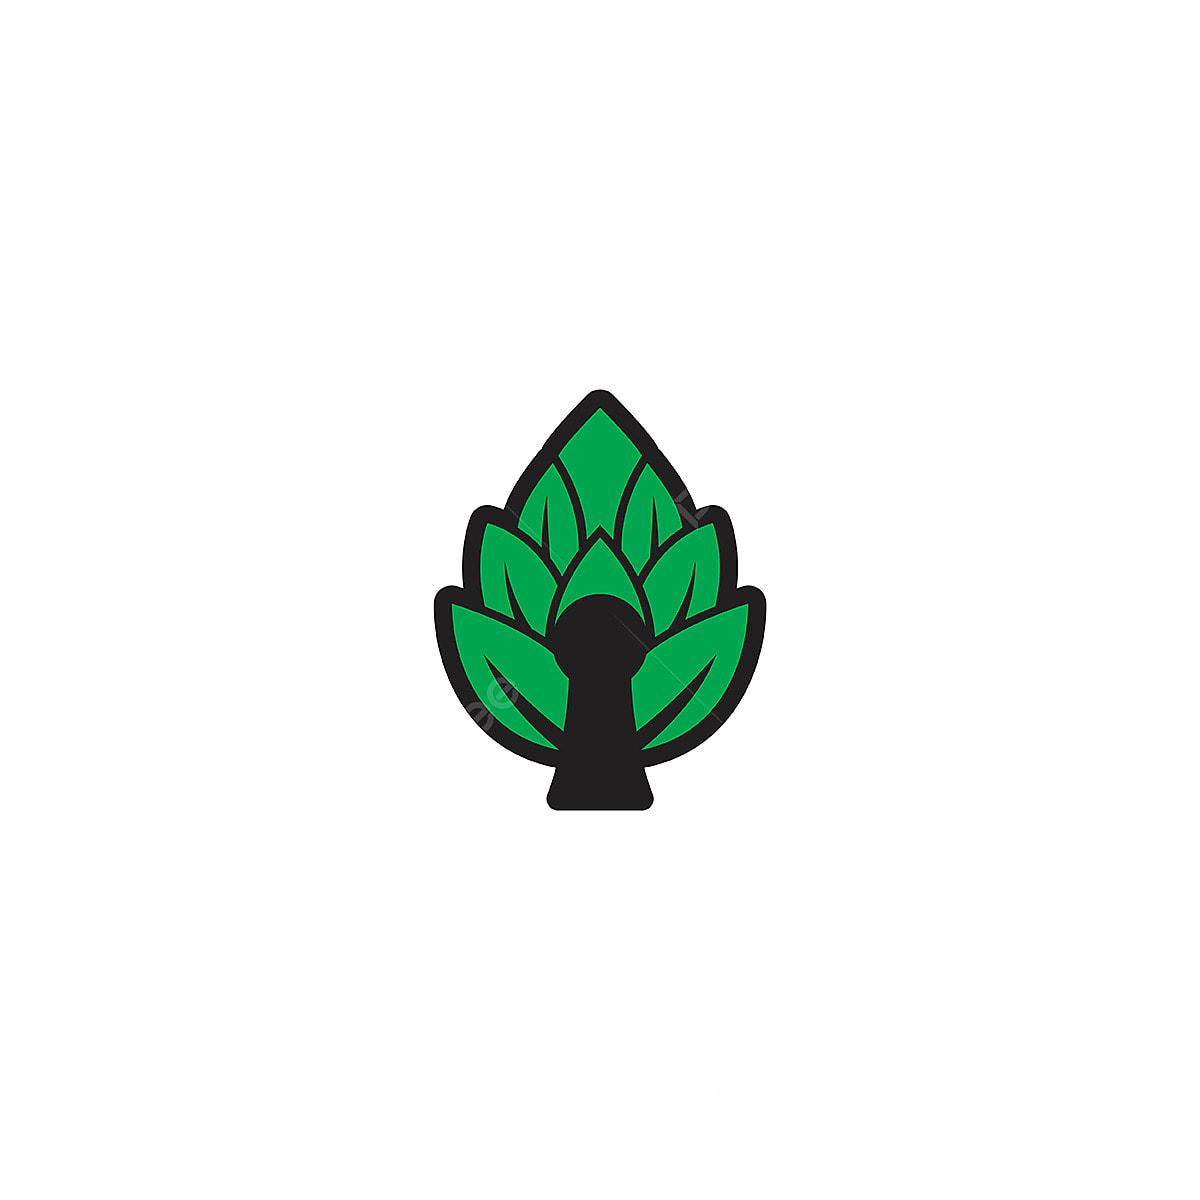 Cerveja Casa Lupulo Logotipo Desenhos Inspiracao Isolado No Branco